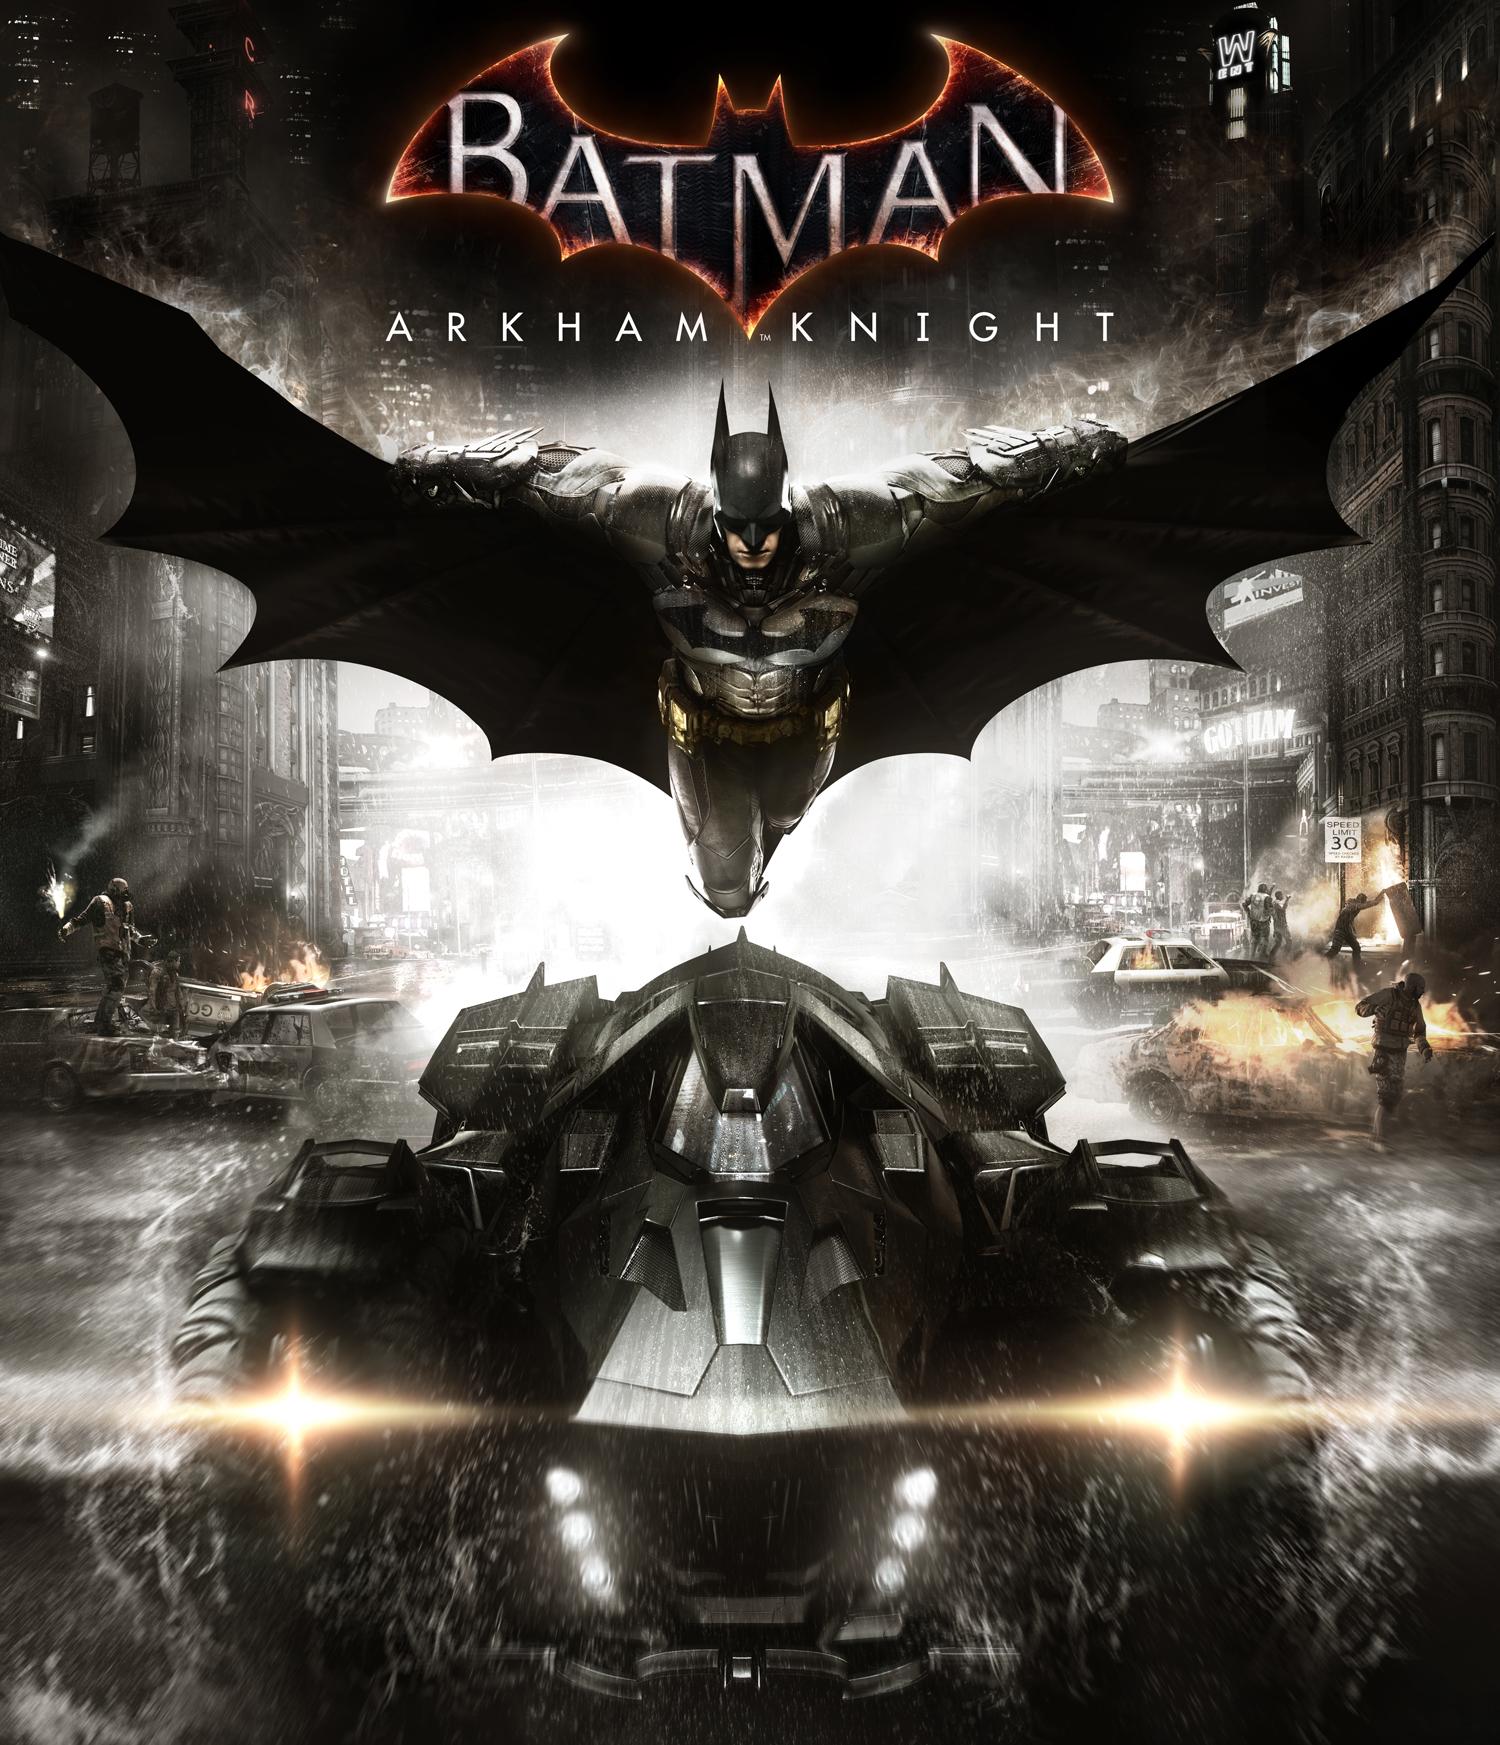 Batman Arkham Knight cover art نقد و همچنین بررسی کردن بازی «بتمن: شوالیهی آرکام Batman: Arkham Knight»